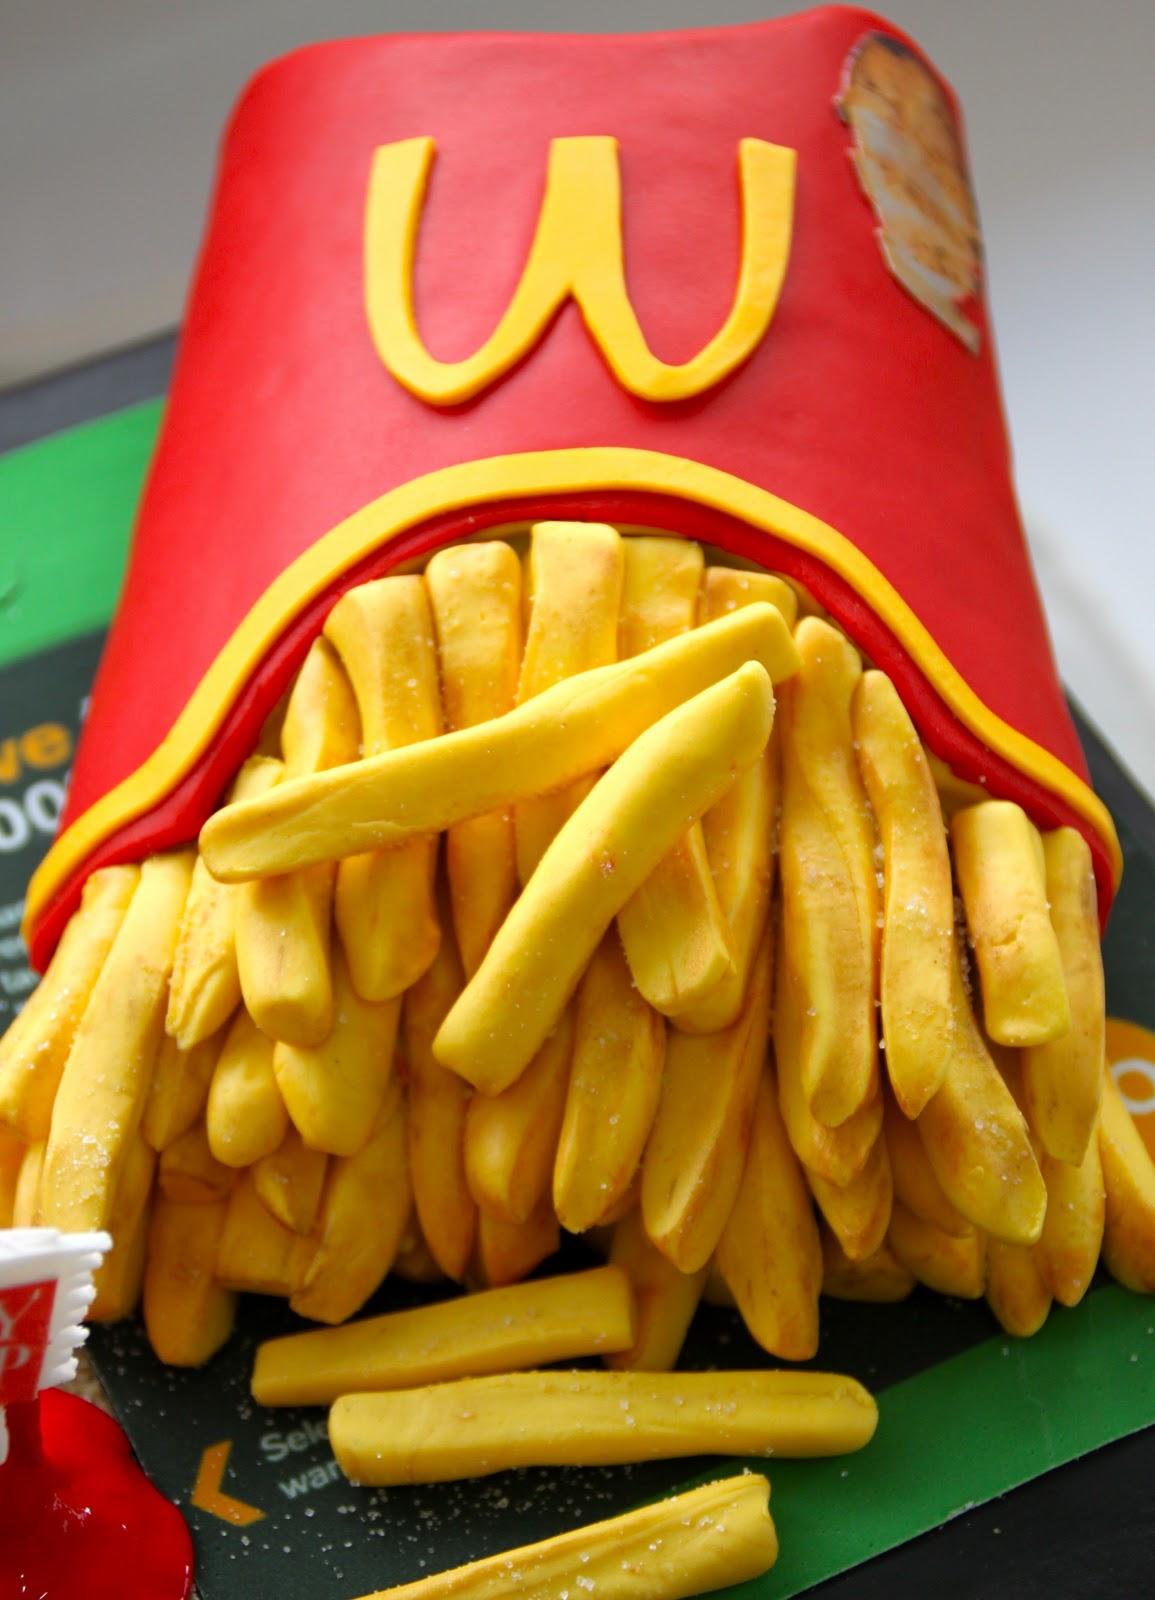 Mcdonalds Fries And Bu...